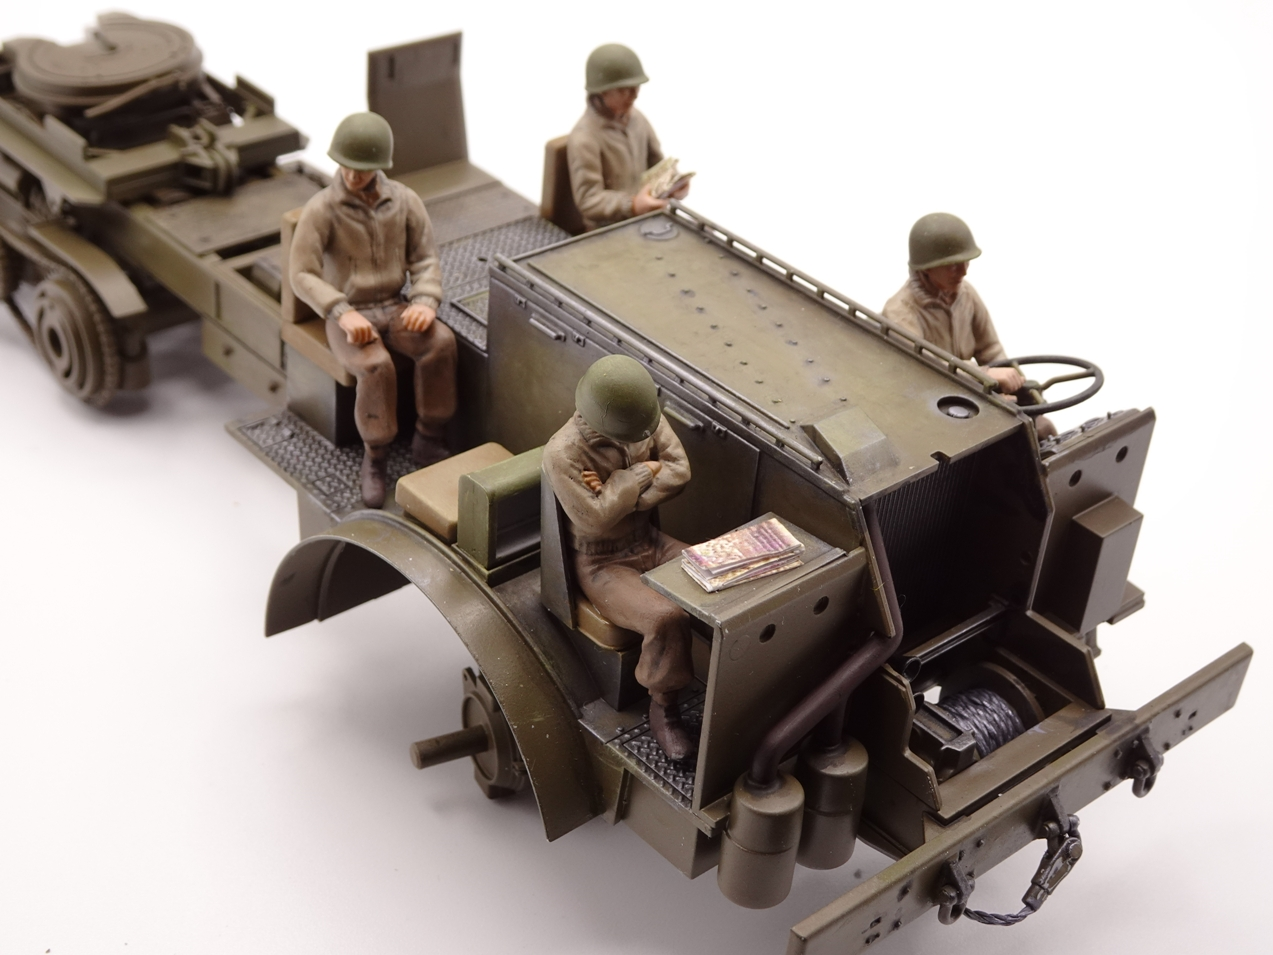 [Tamiya 1/35] M26 Armored tank recovery vehicle réf. 35244 - Page 3 M26-1510-2